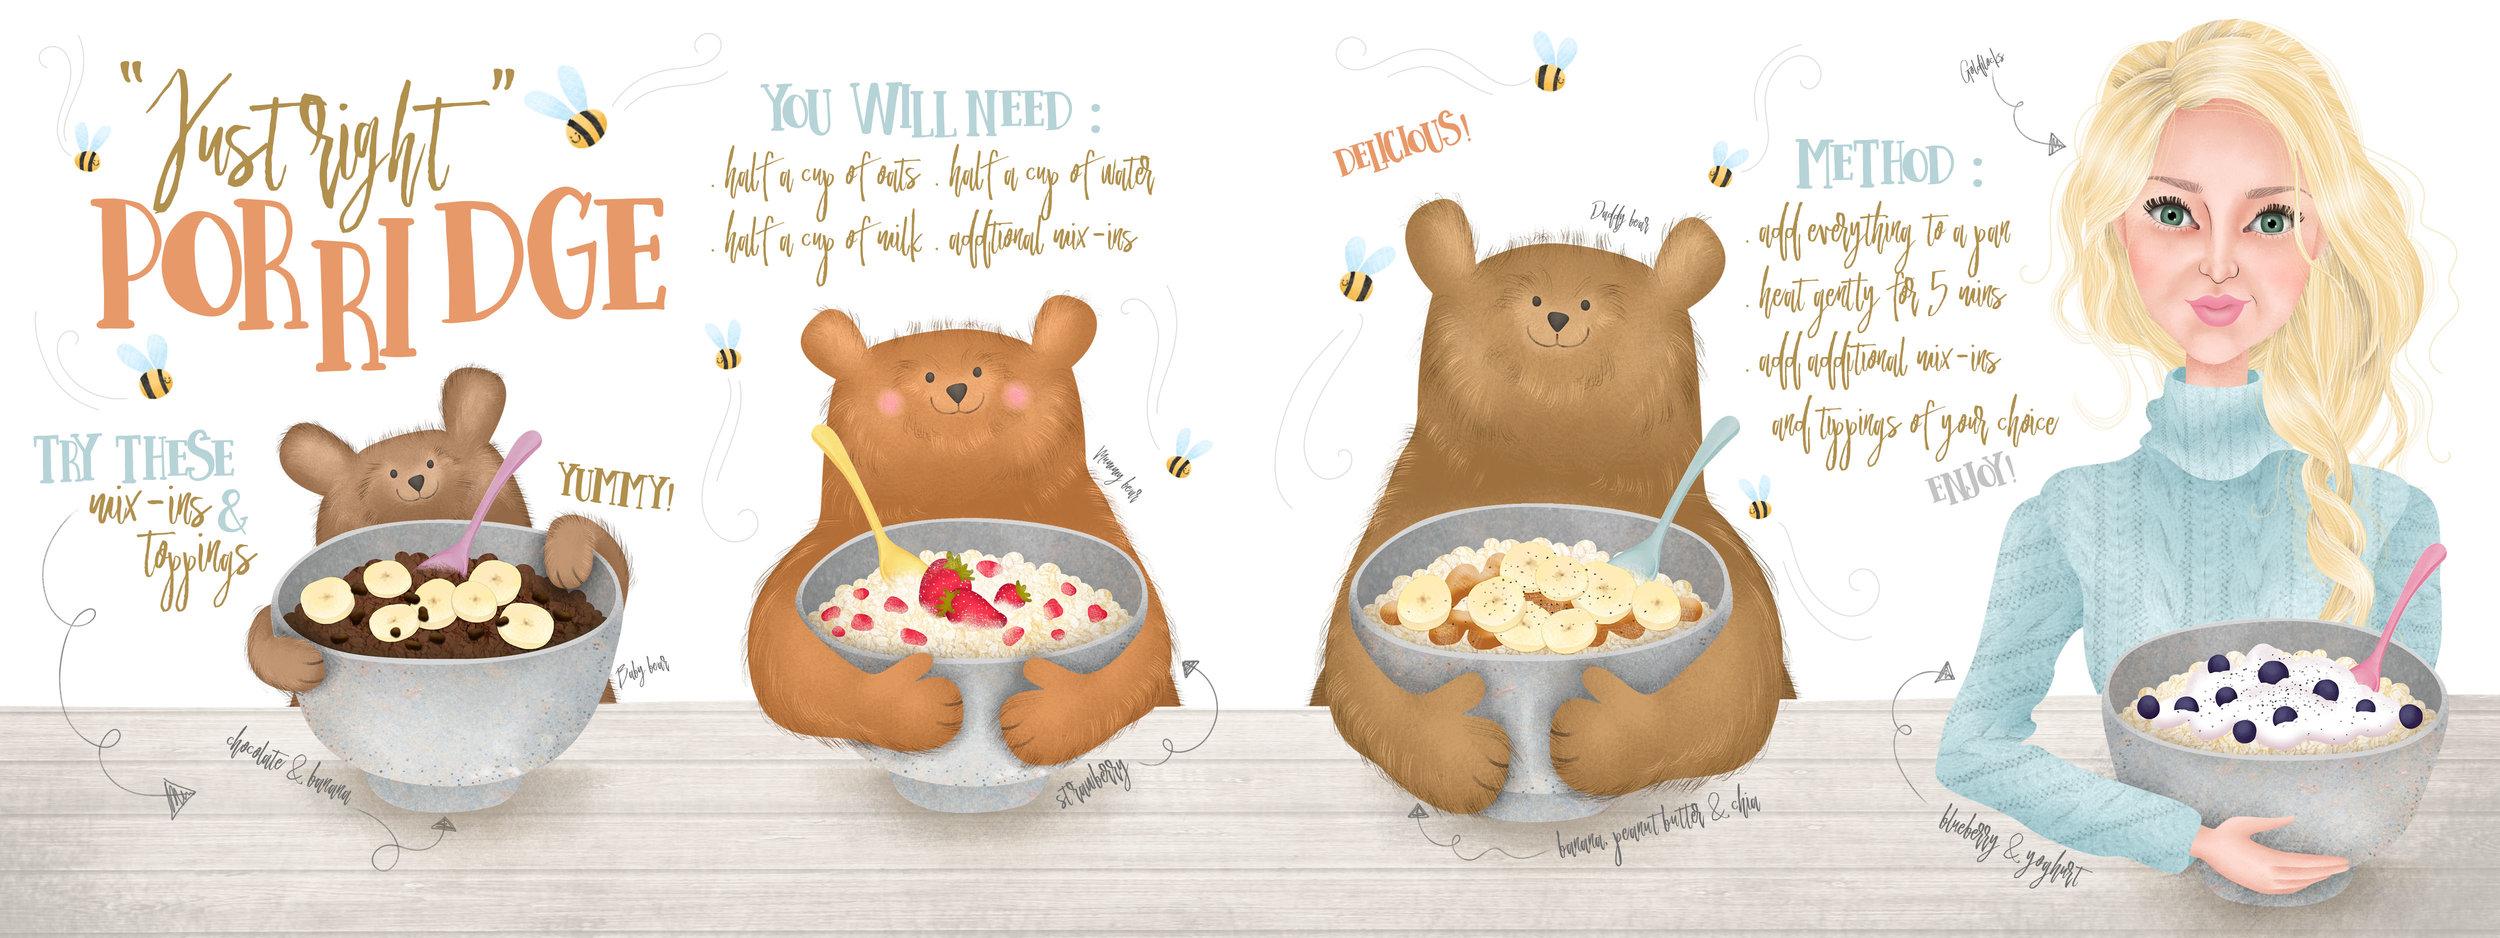 """Just Right"" Porridge – Goldilocks and The Three Bears inspired."